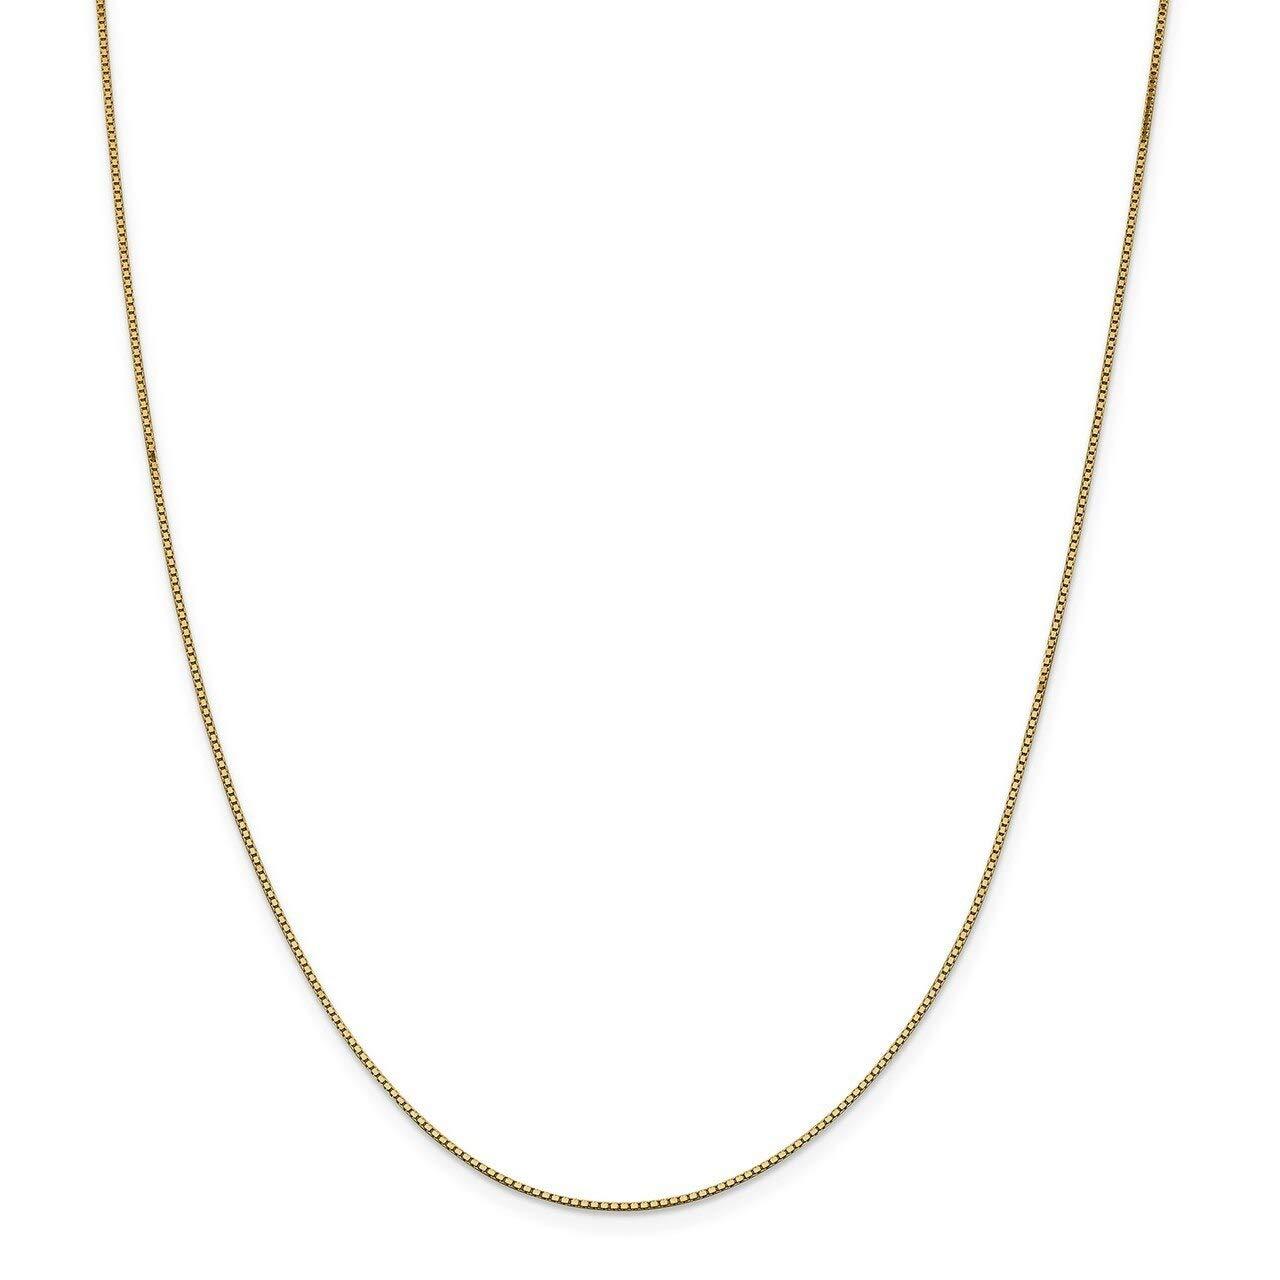 Lex /& Lu 14k Yellow Gold .95mm Box Chain Bracelet or Necklace